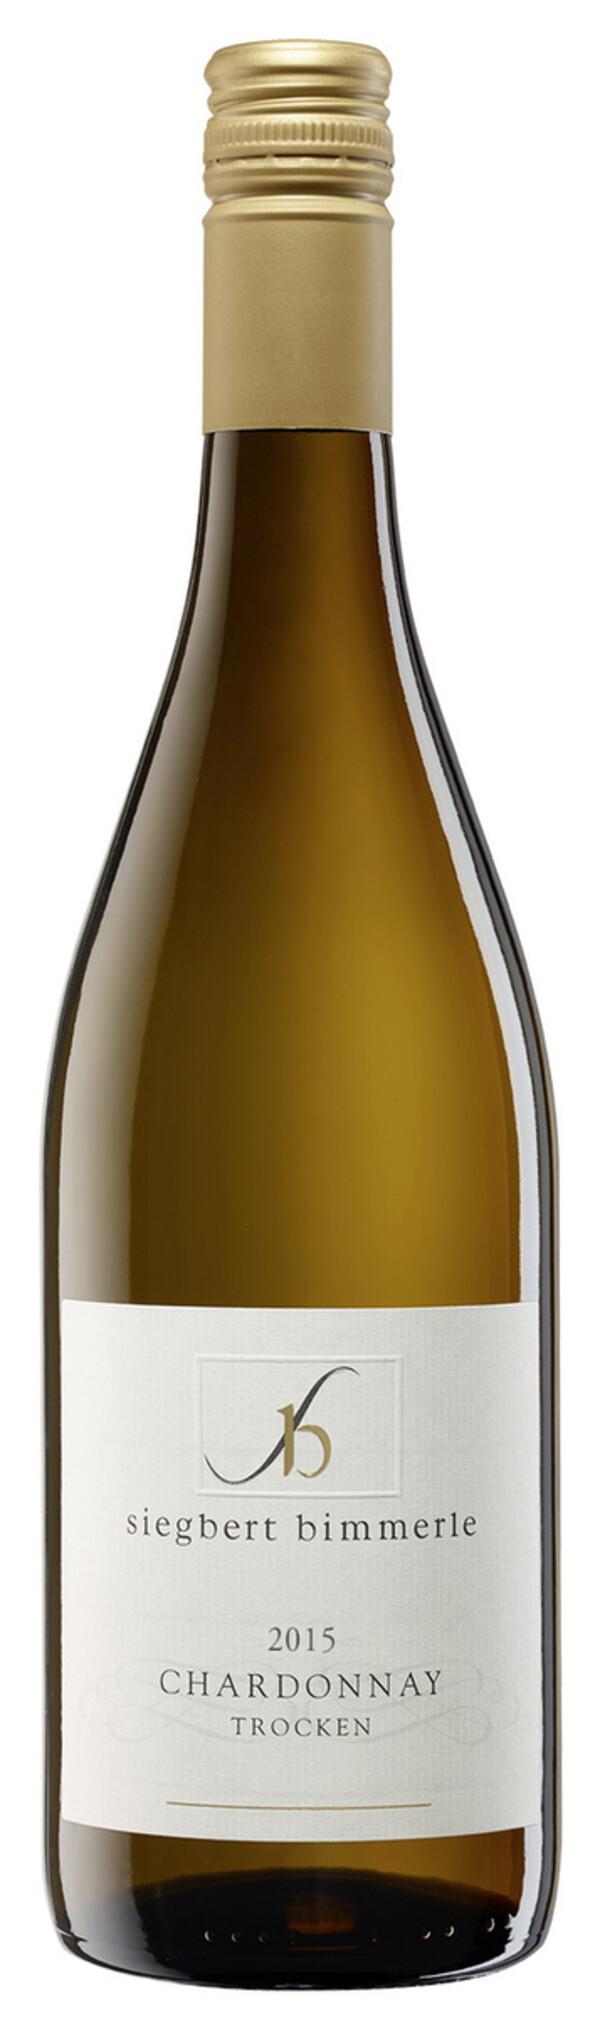 Siegbert Bimmerle Chardonnay Weißwein trocken 2018 0,75 ltr